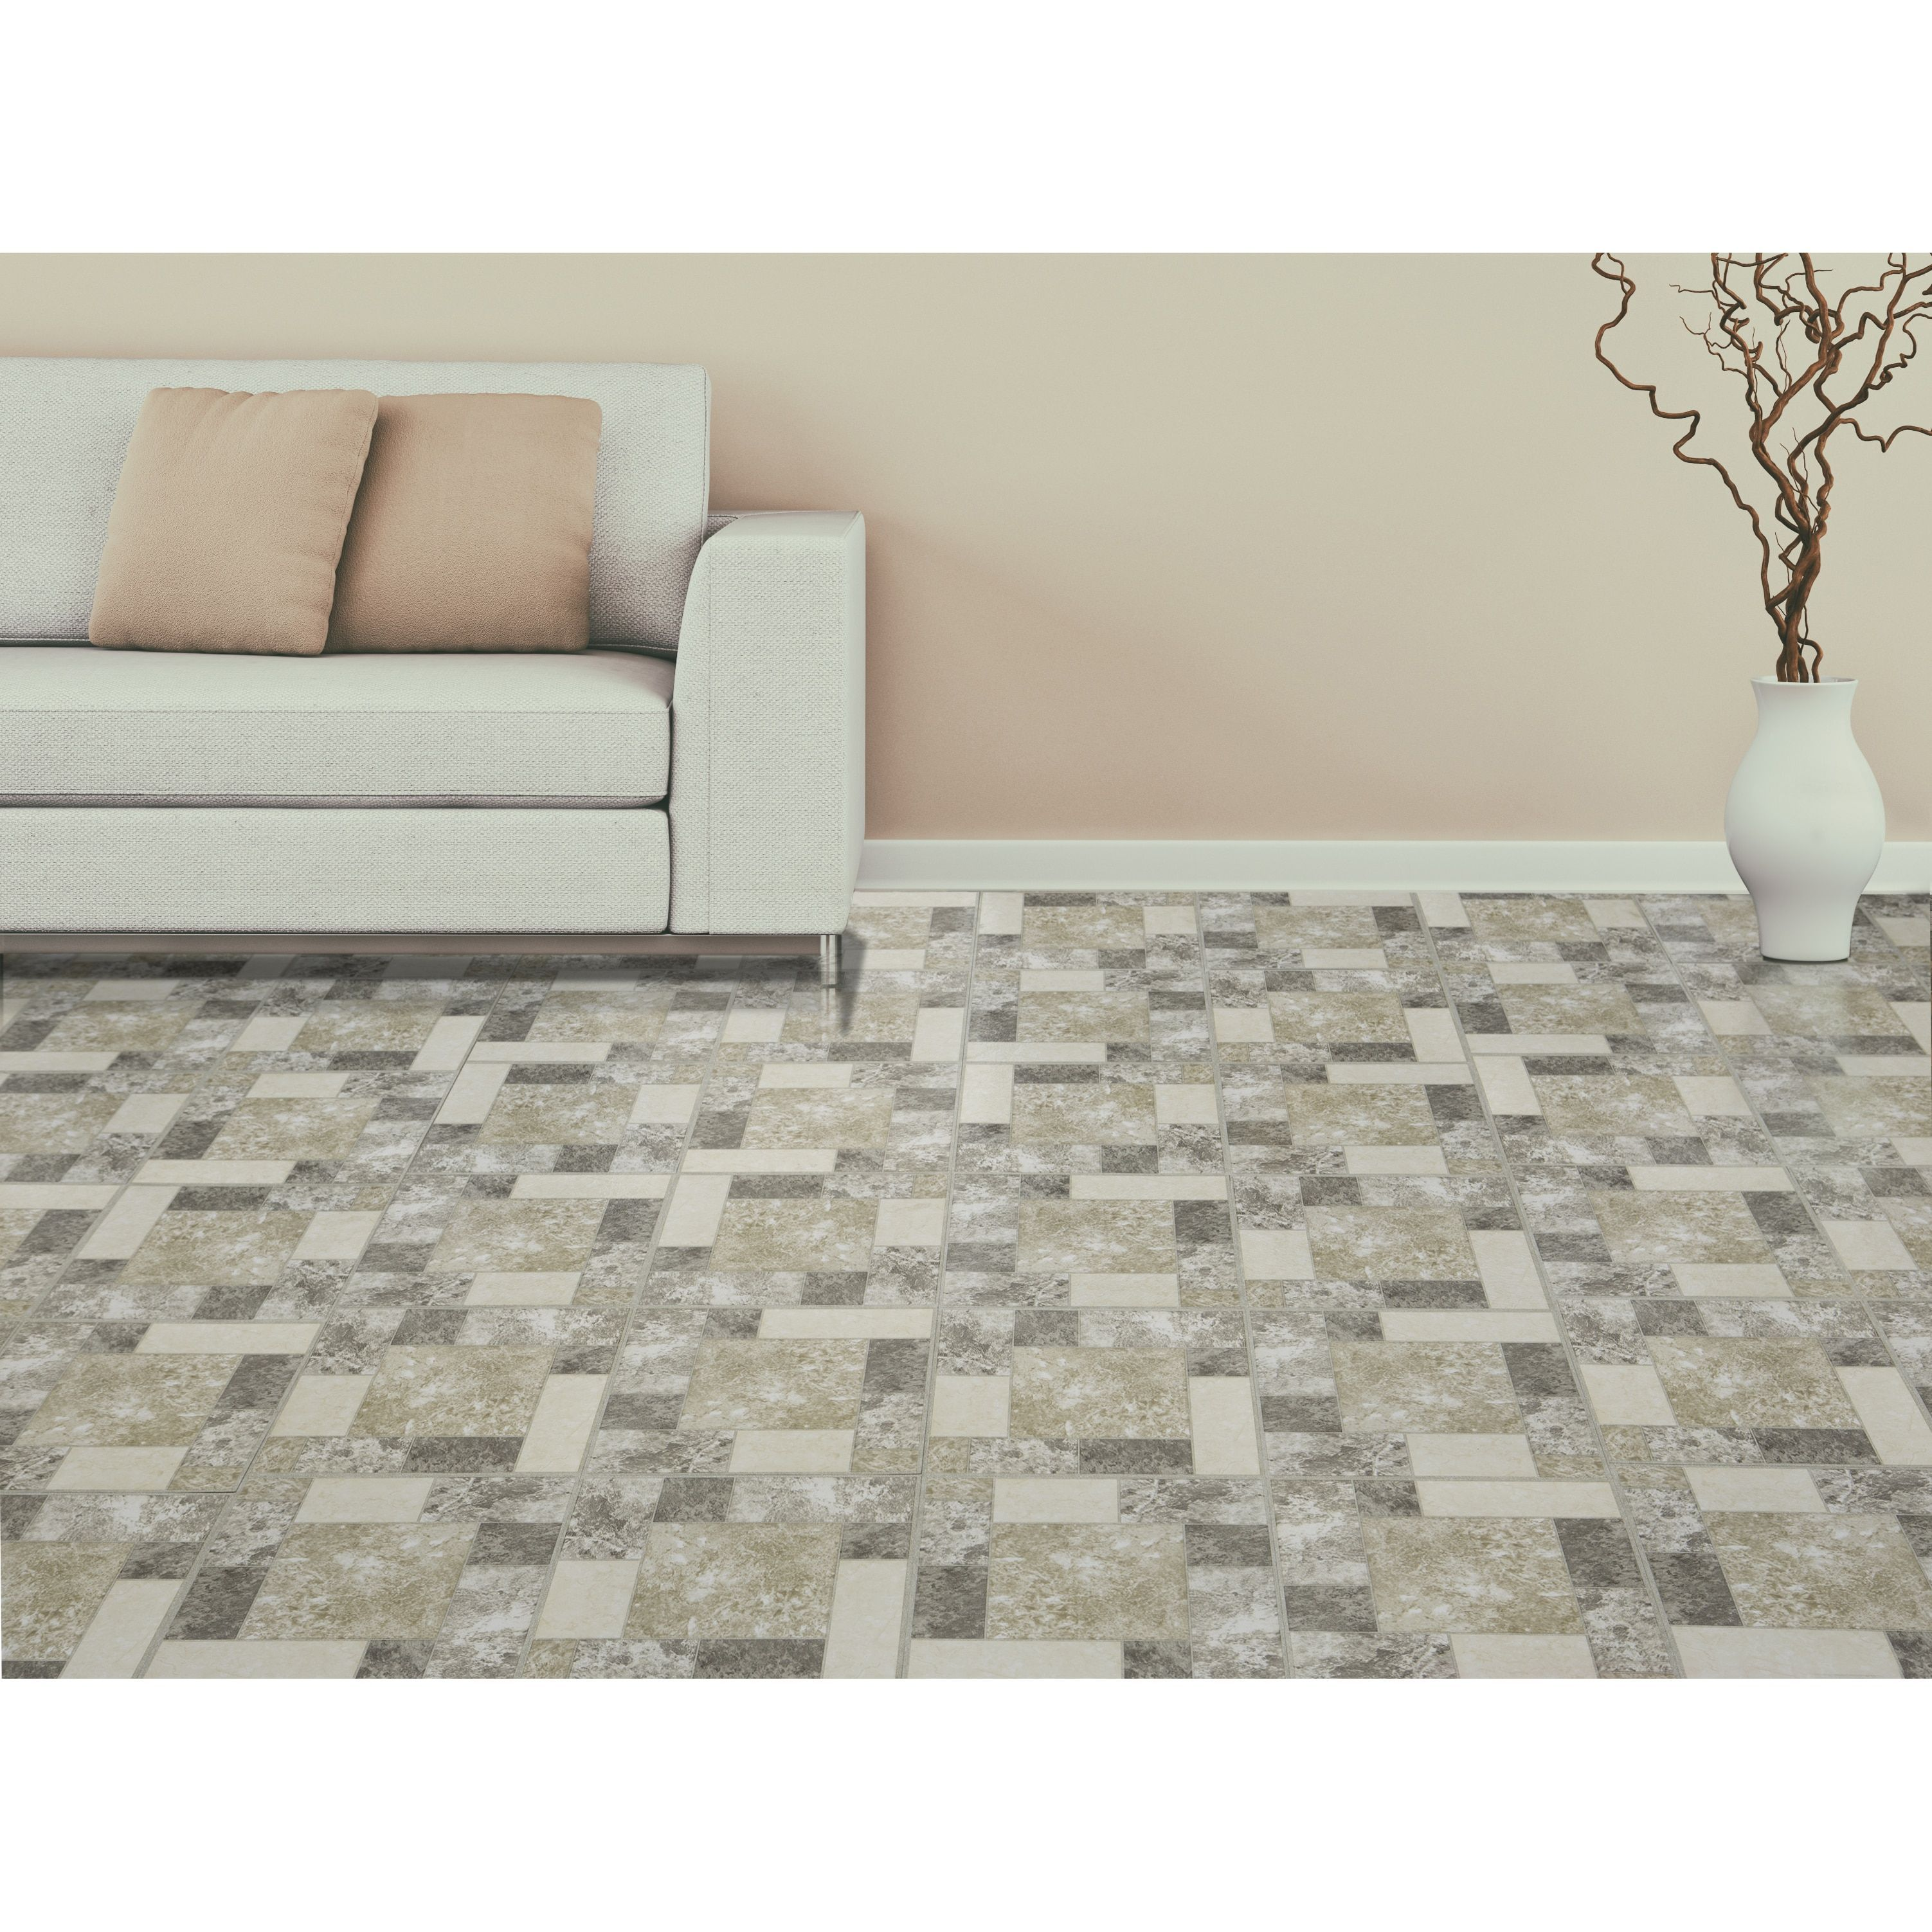 Achim tivoli marble blocks 12x12 self adhesive vinyl floor tile 45 achim tivoli marble blocks 12x12 self adhesive floor tile 45 tiles45 sq ft dailygadgetfo Choice Image